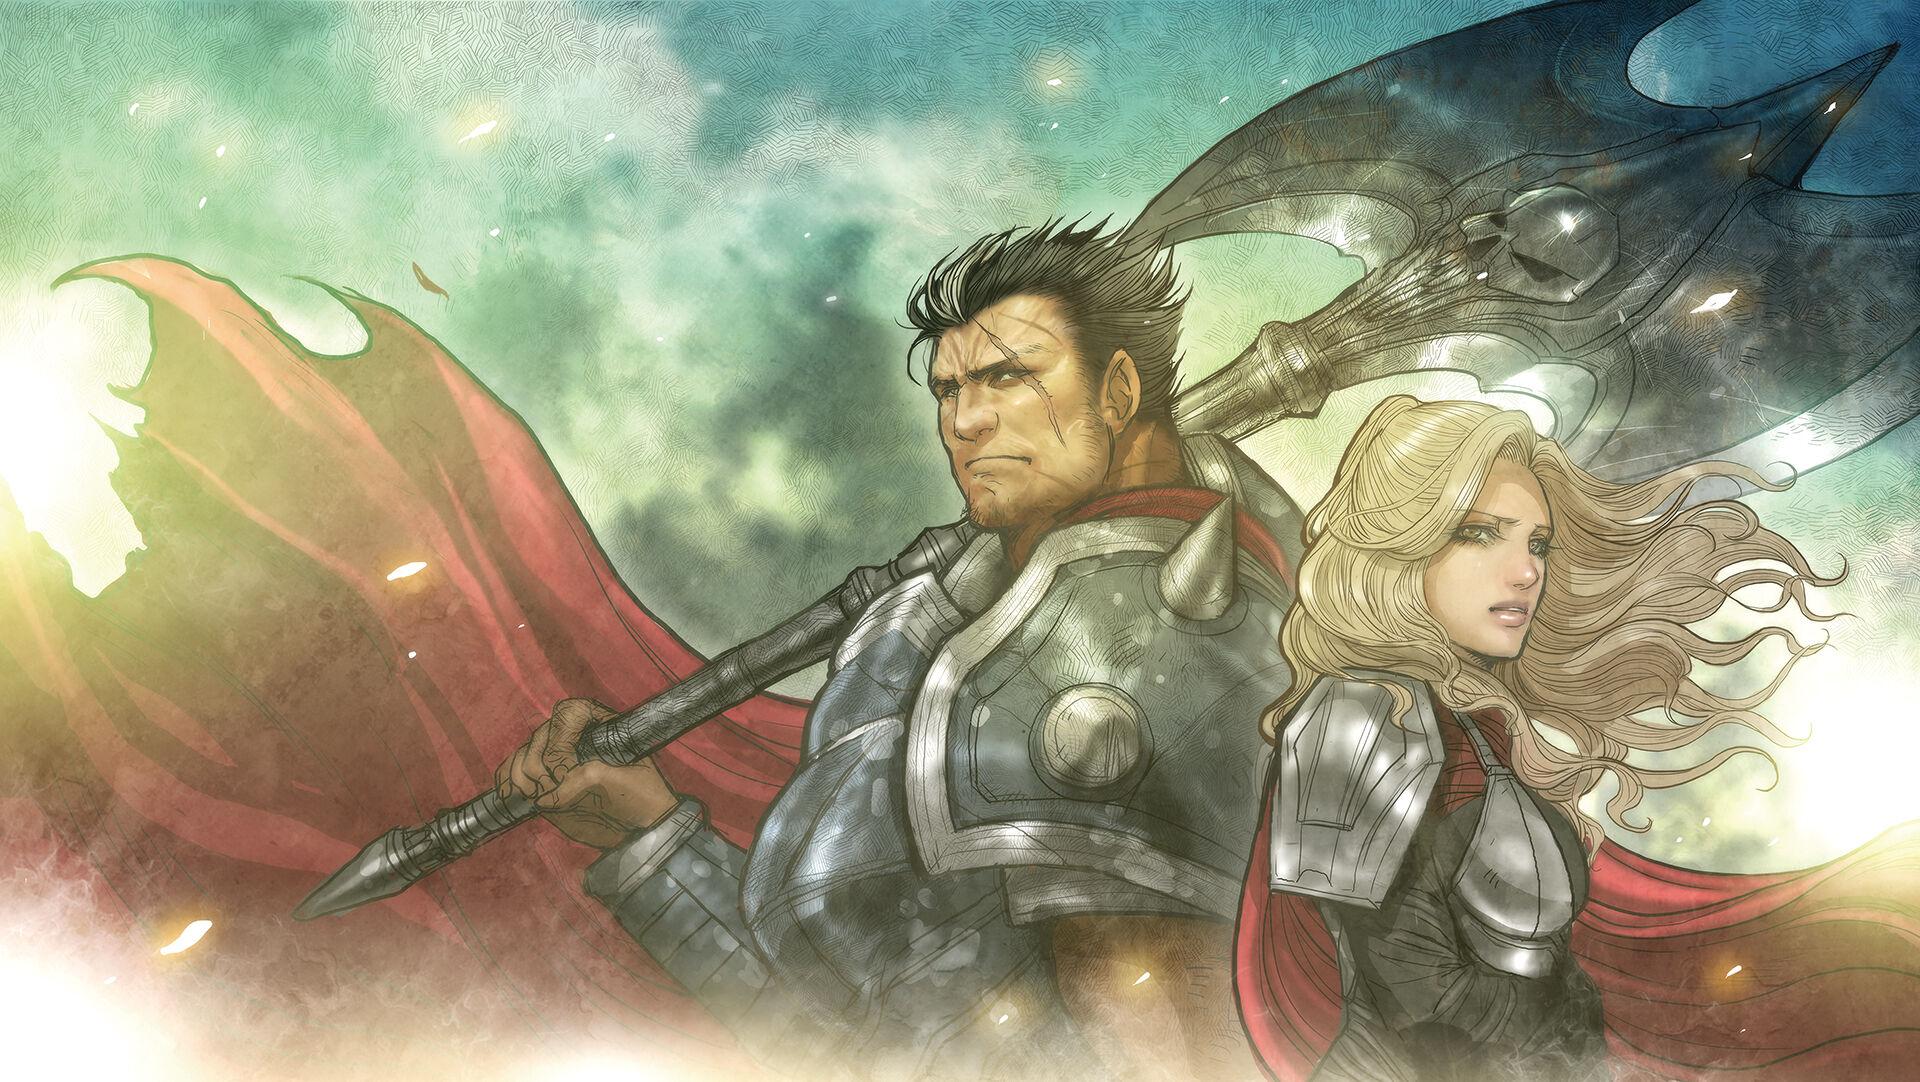 Darius Blood Of Noxus cover 02.jpg